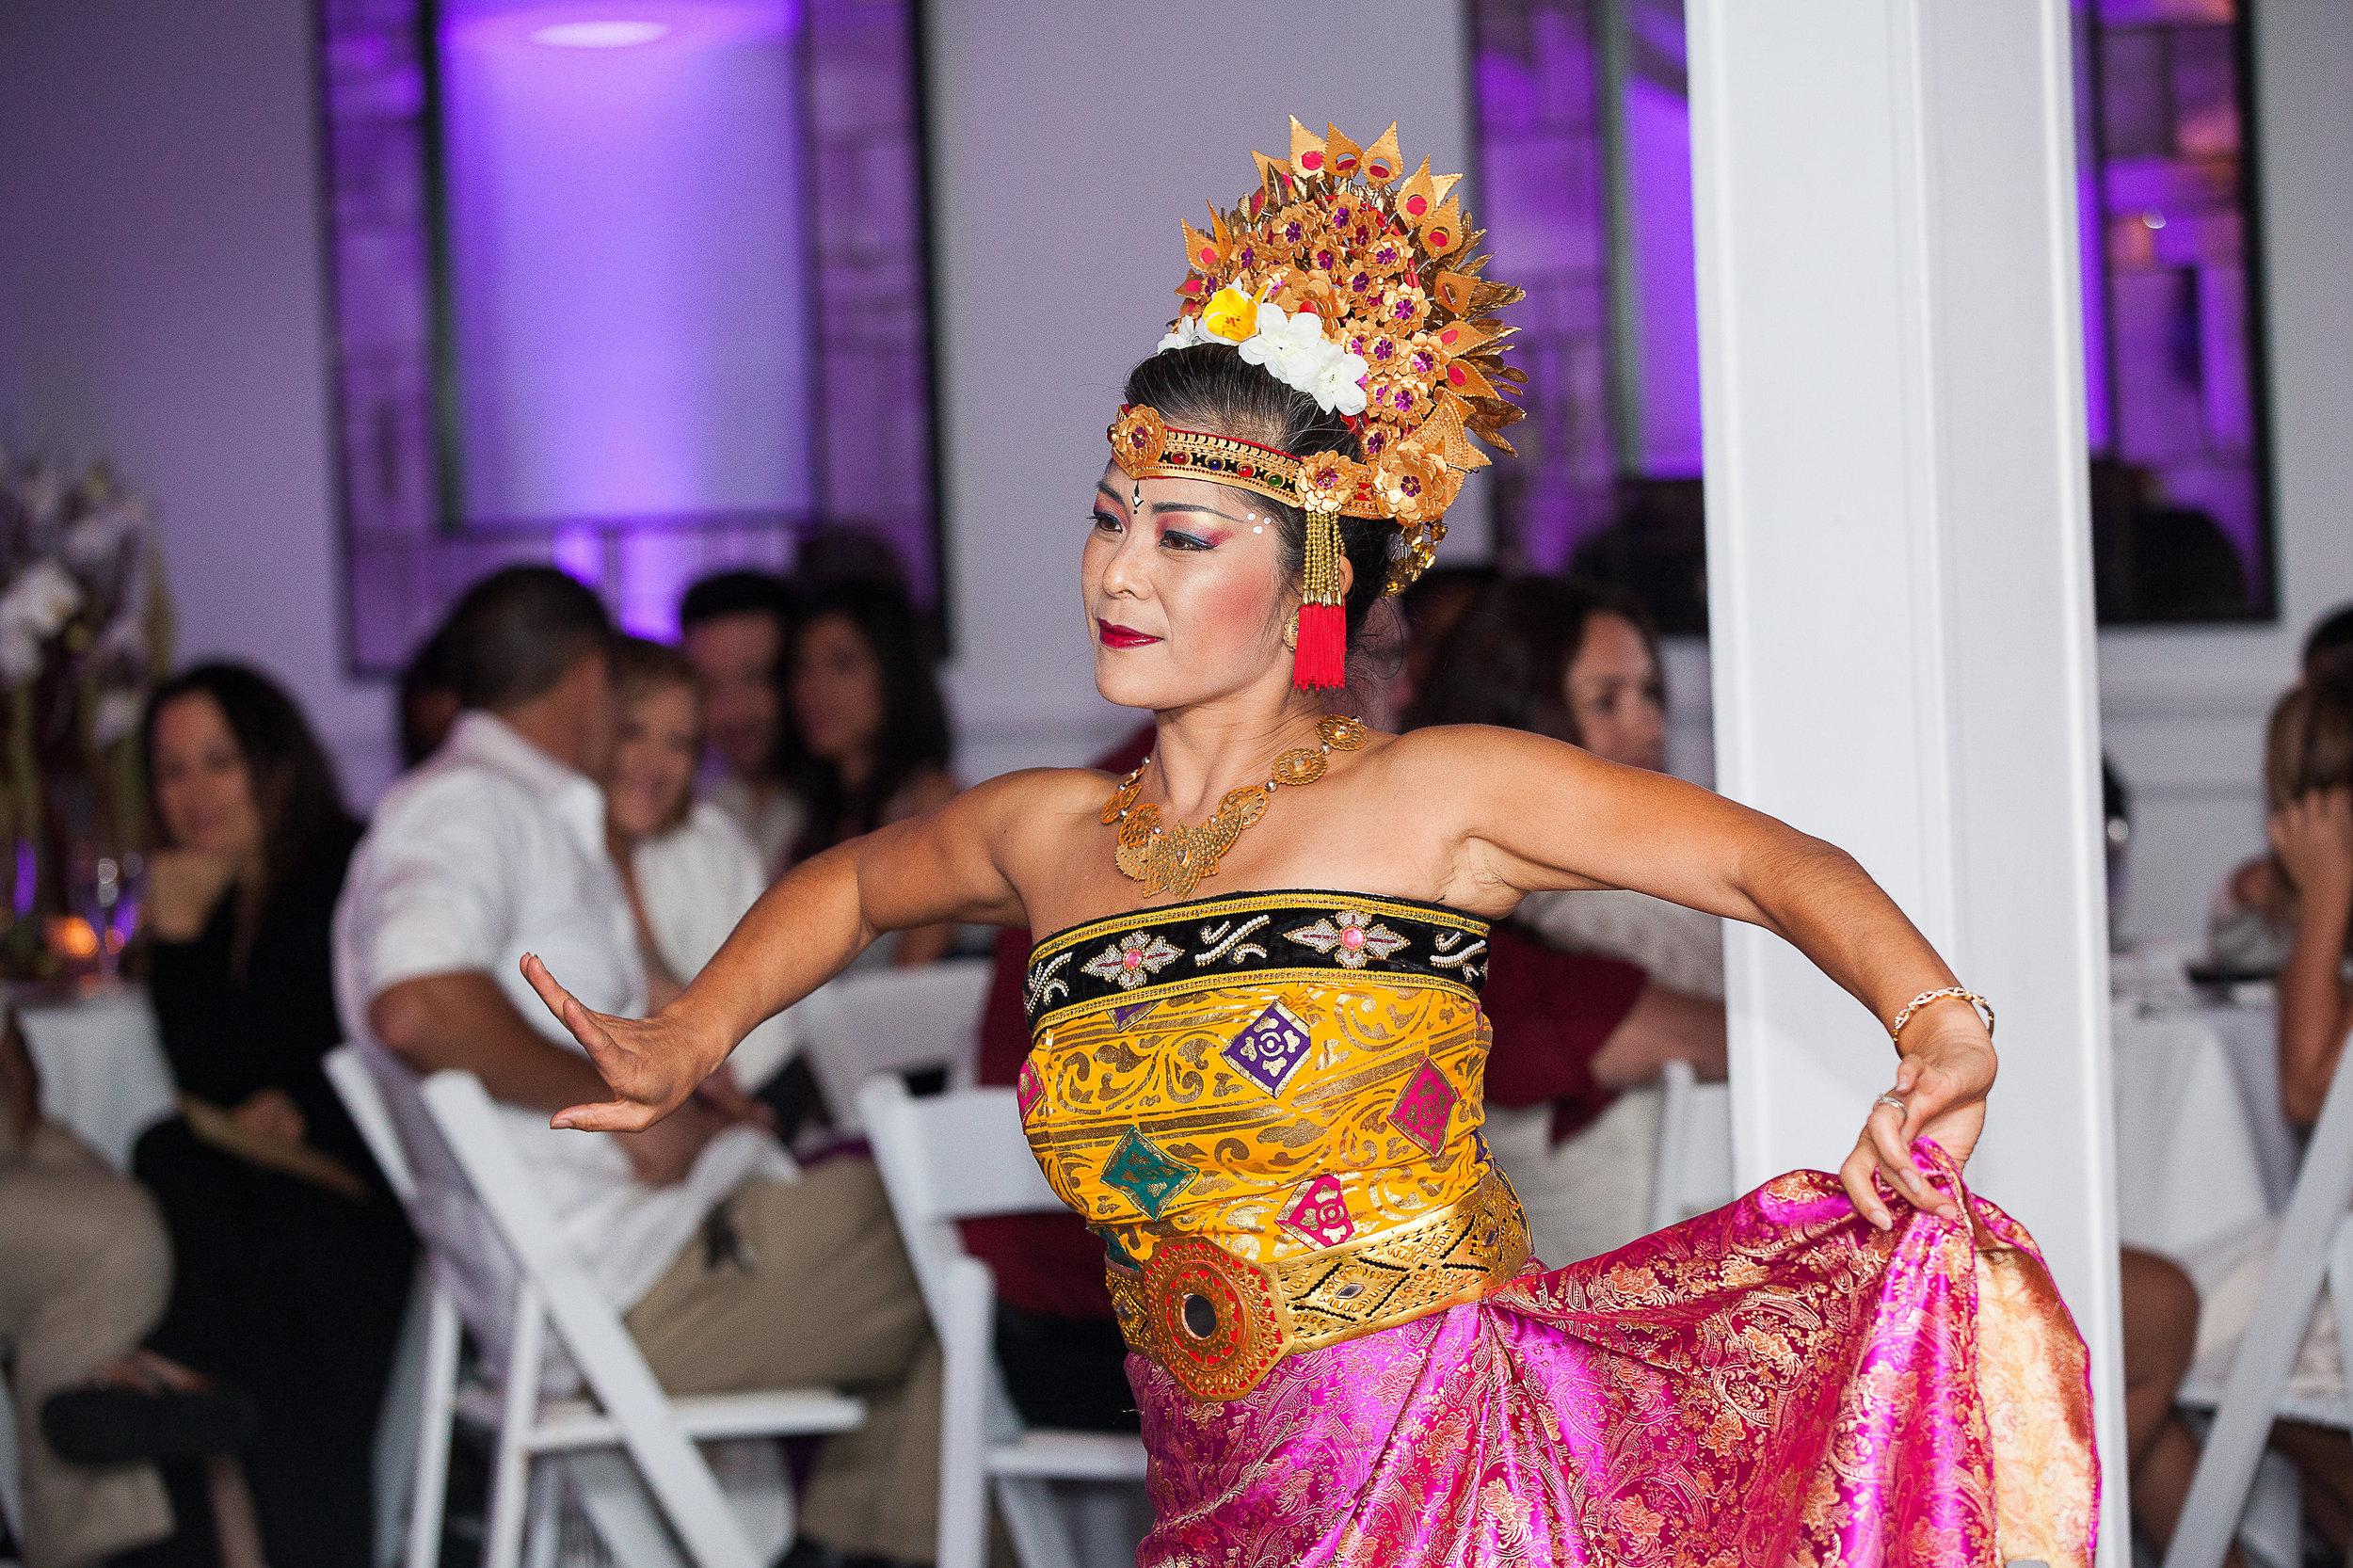 Balinese wedding dancer